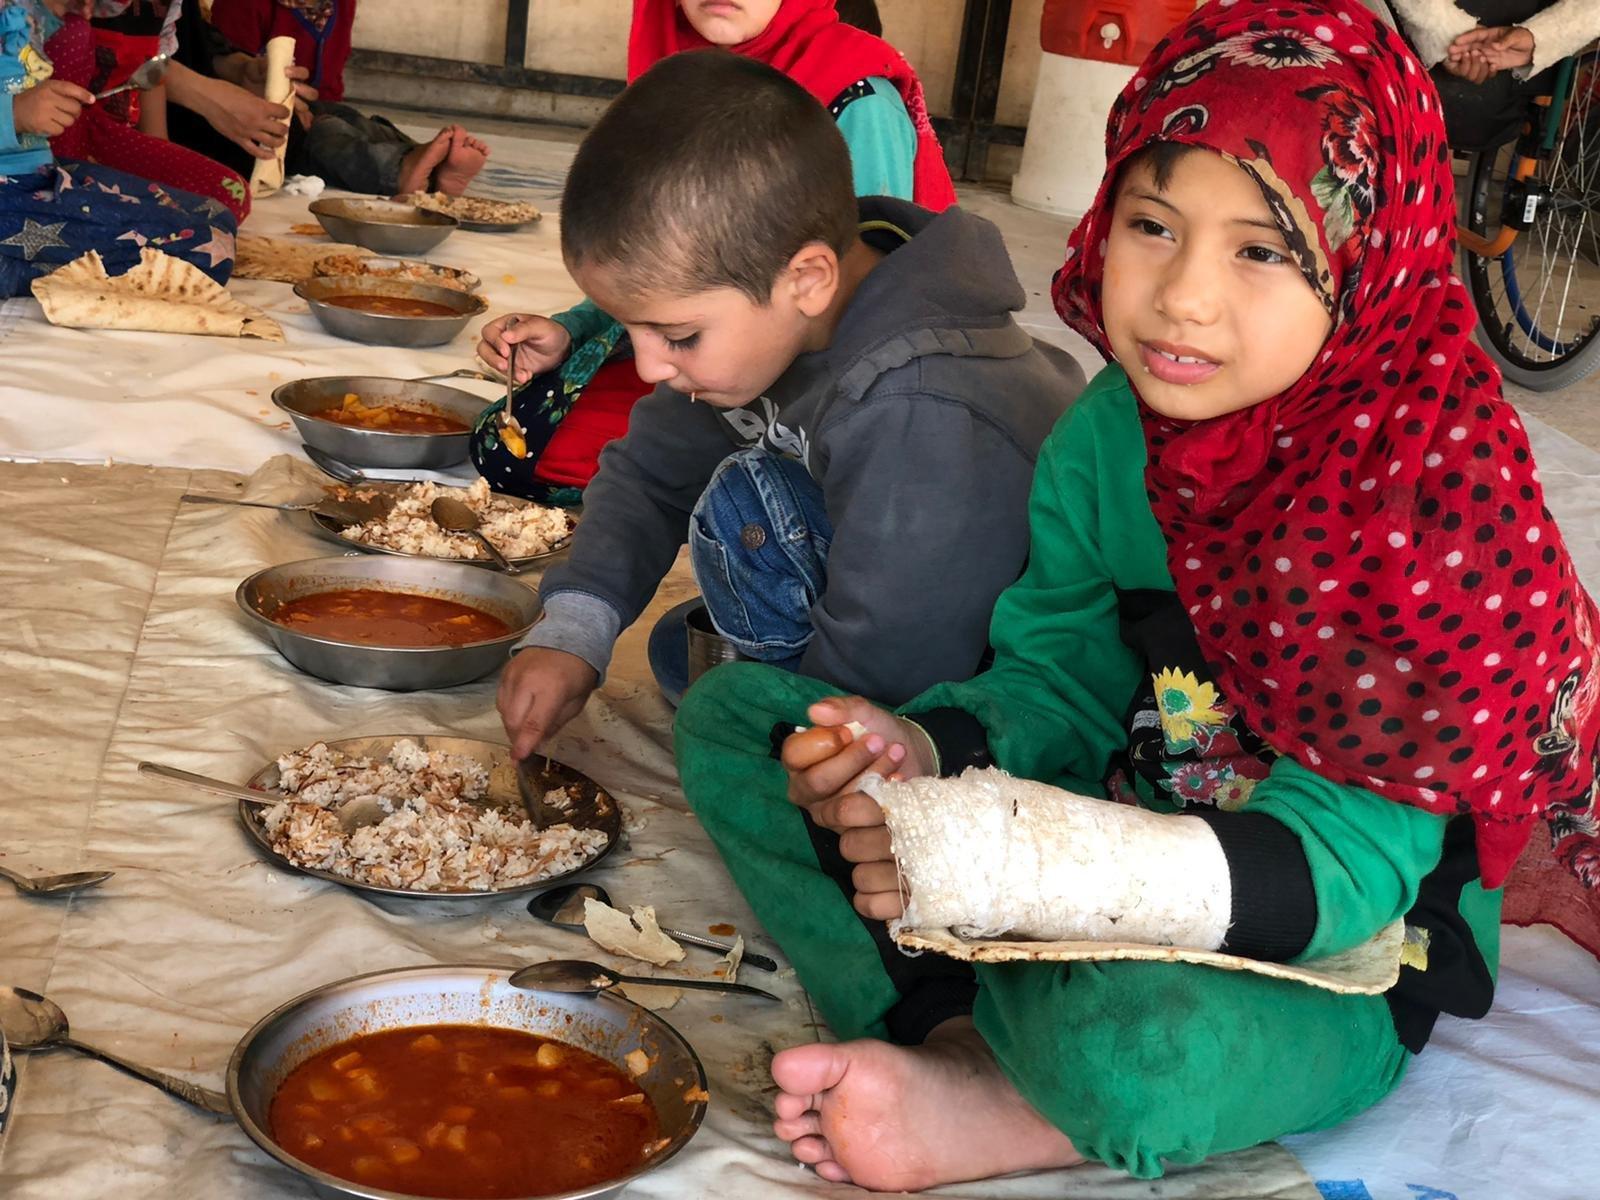 Children in camp in northern Syria